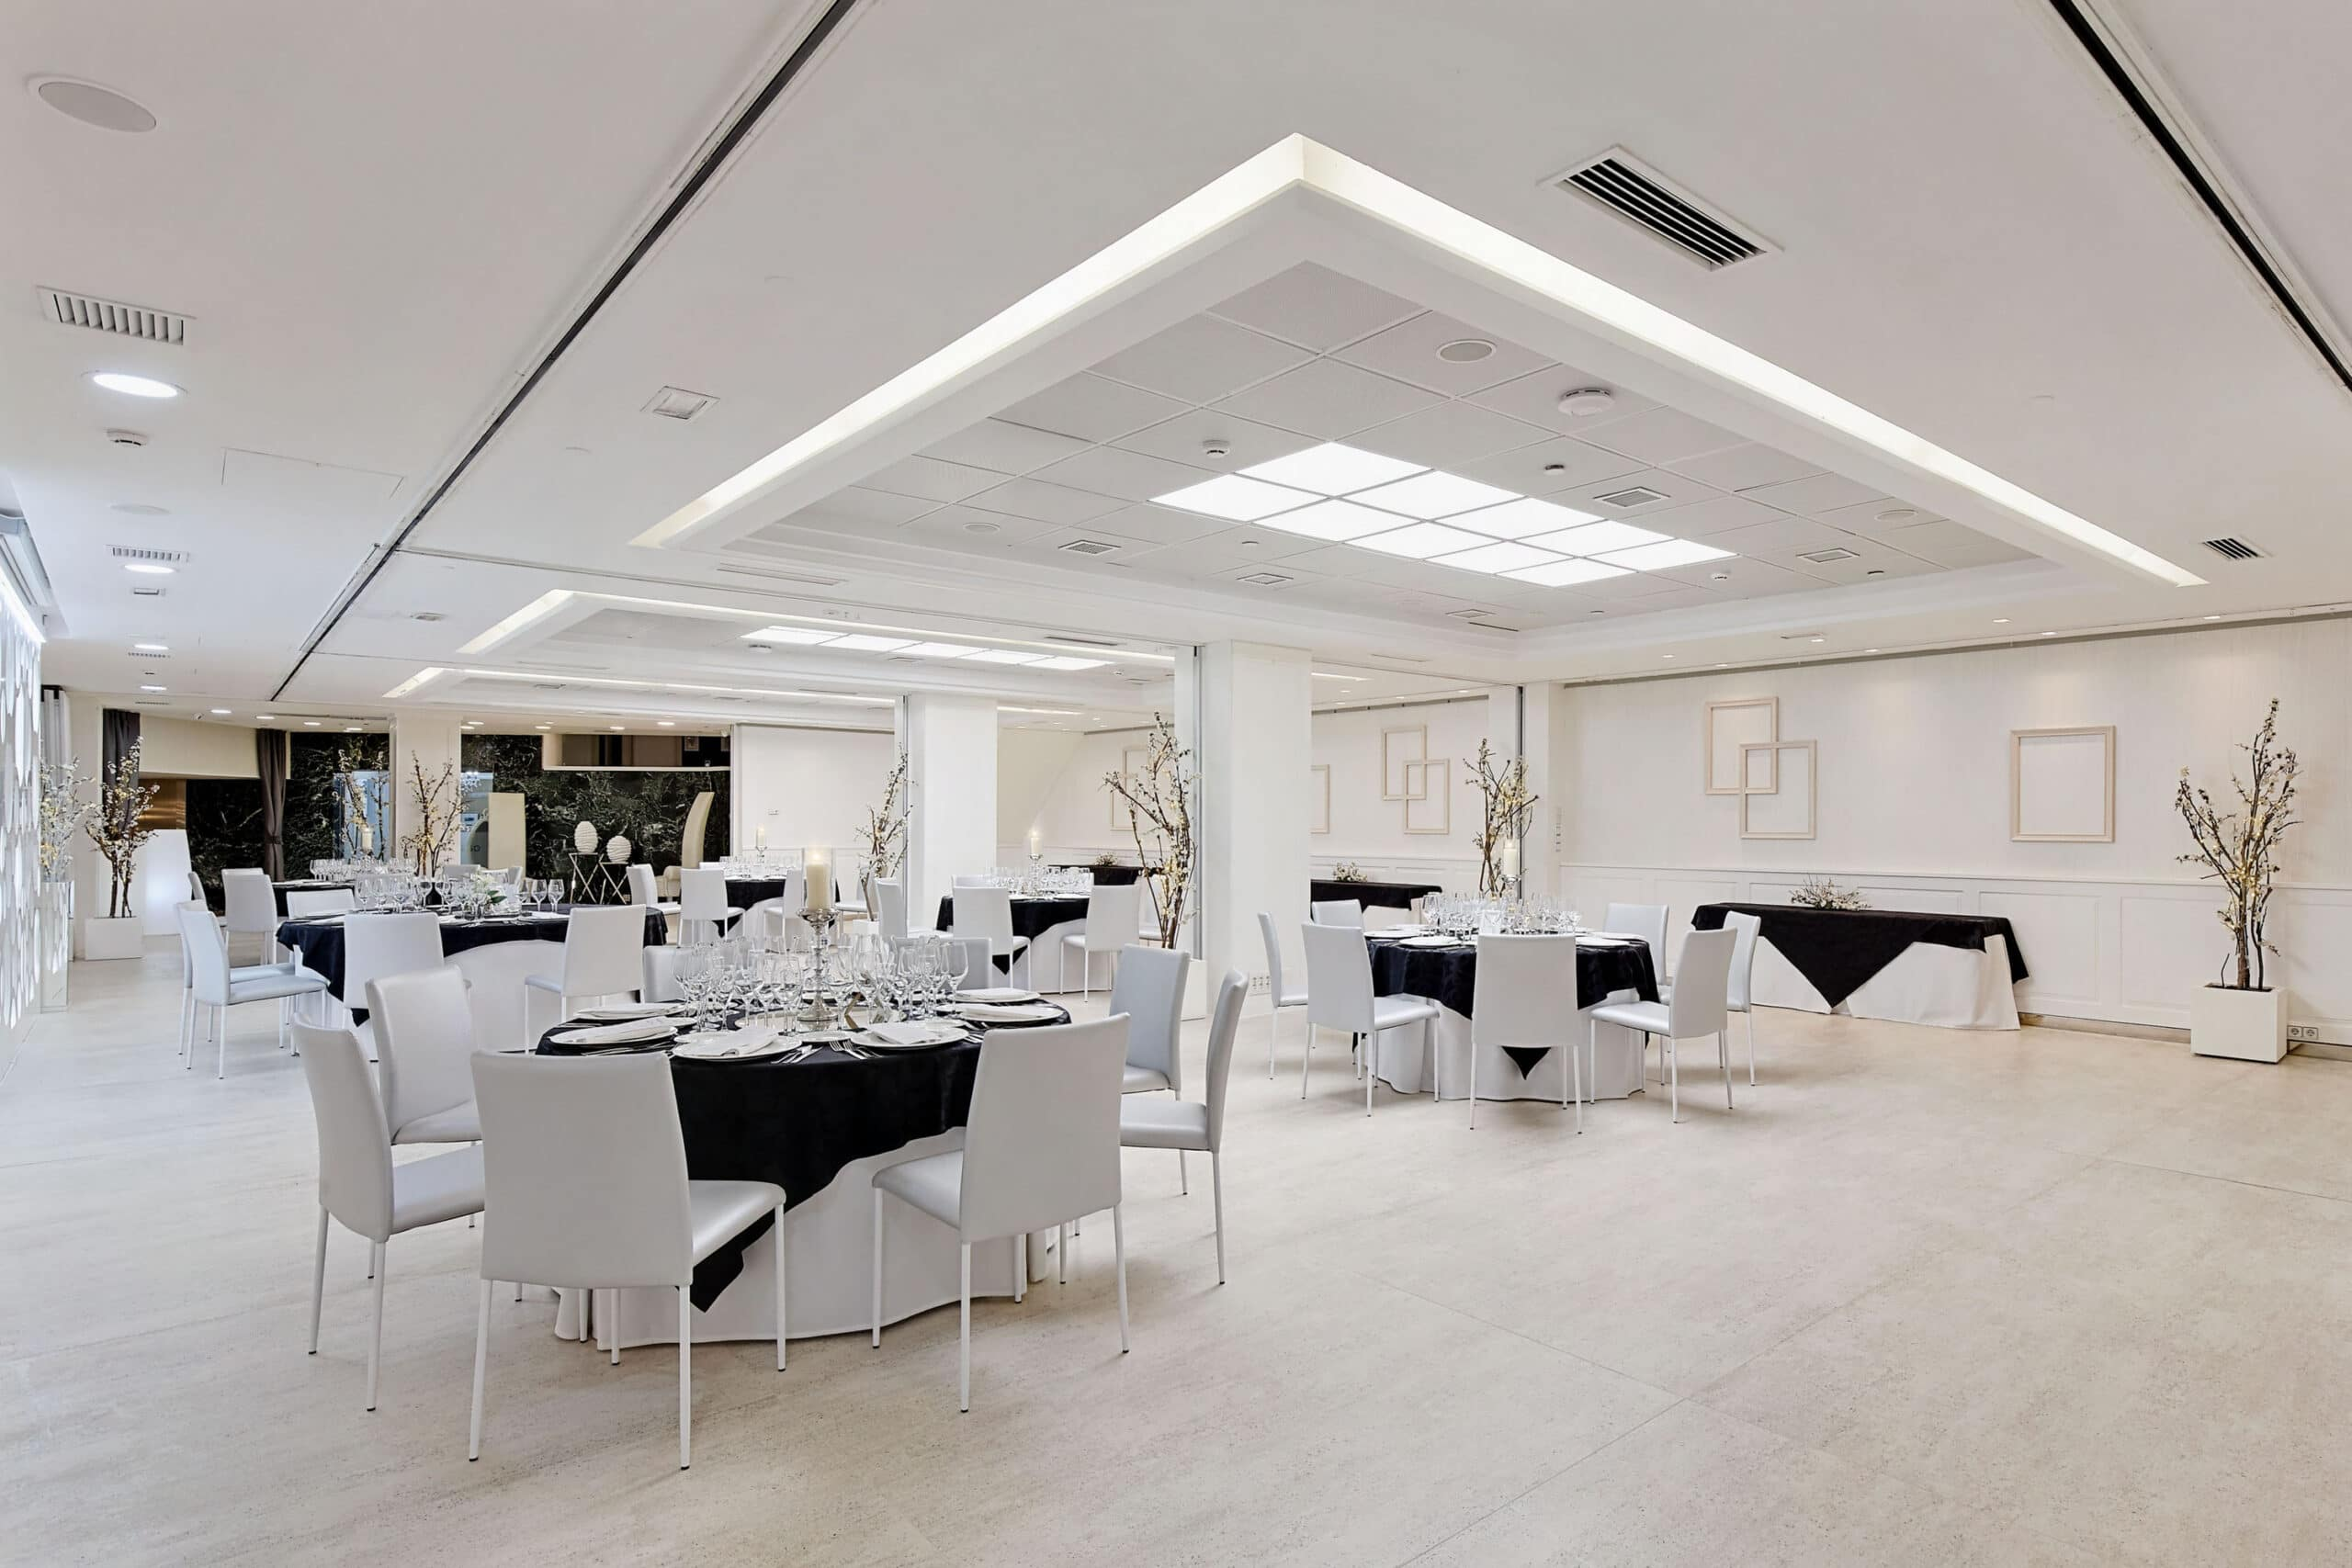 Hotel Mayorazgo  - SALON21 110 AW scaled 64